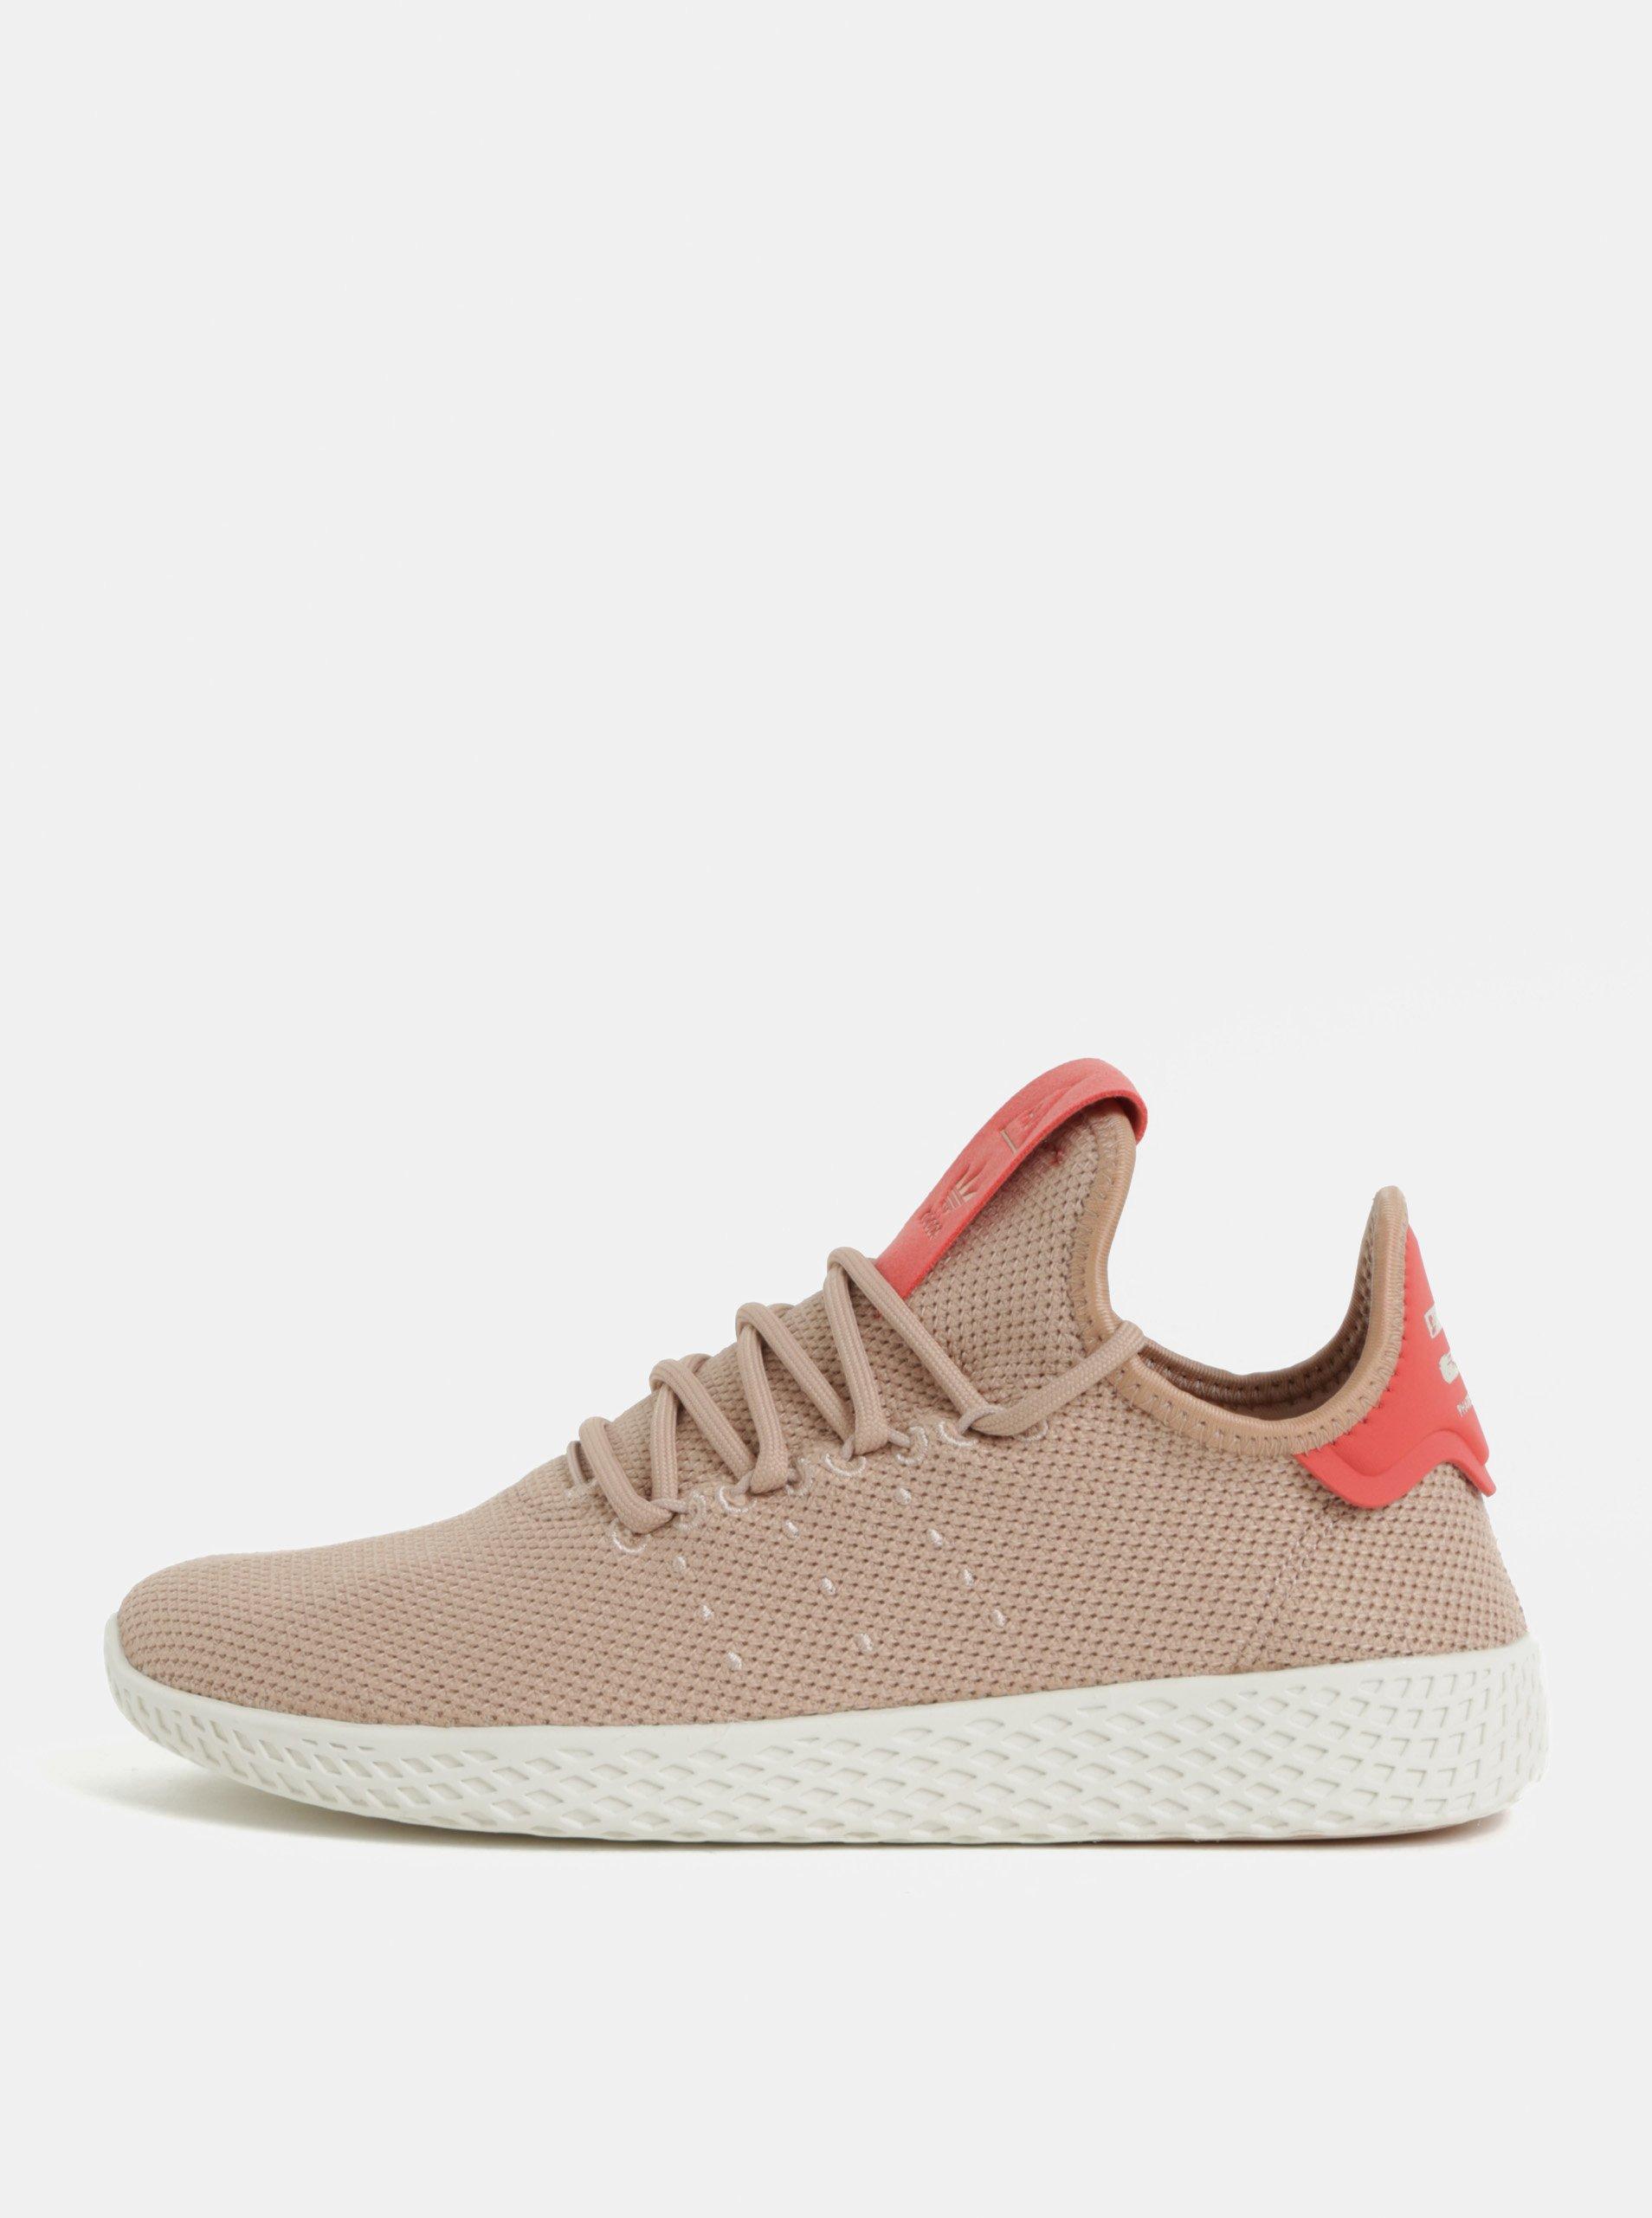 Staroružové dámske tenisky adidas Originals 65ab4a6a191